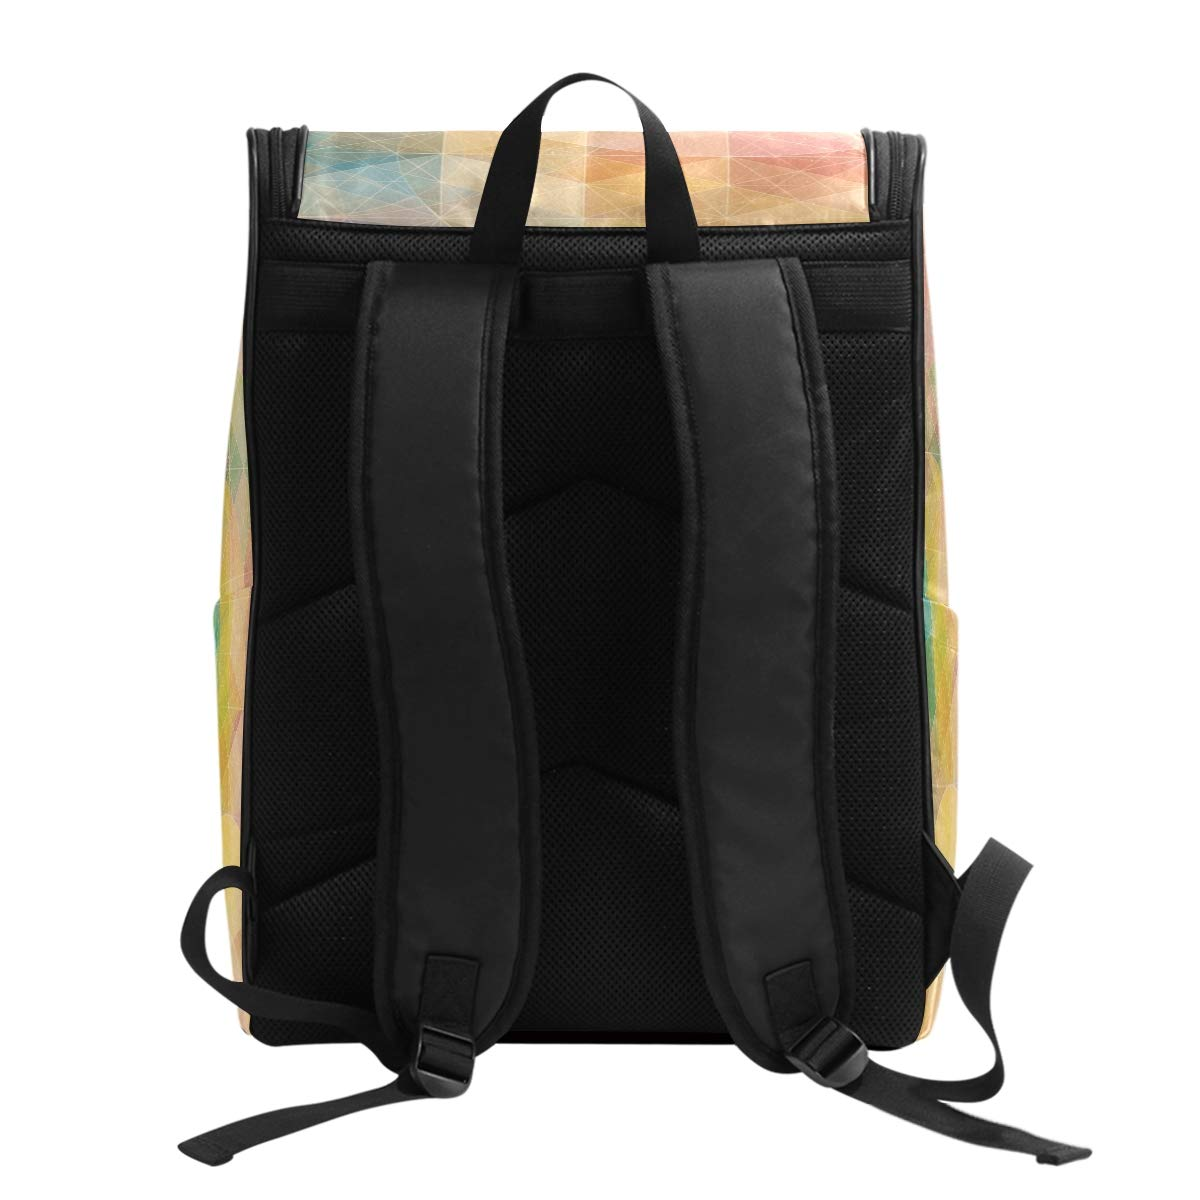 Laptop Backpack Gallery Mustang Horse Gym Backpack for Women Large 3D Bookbag